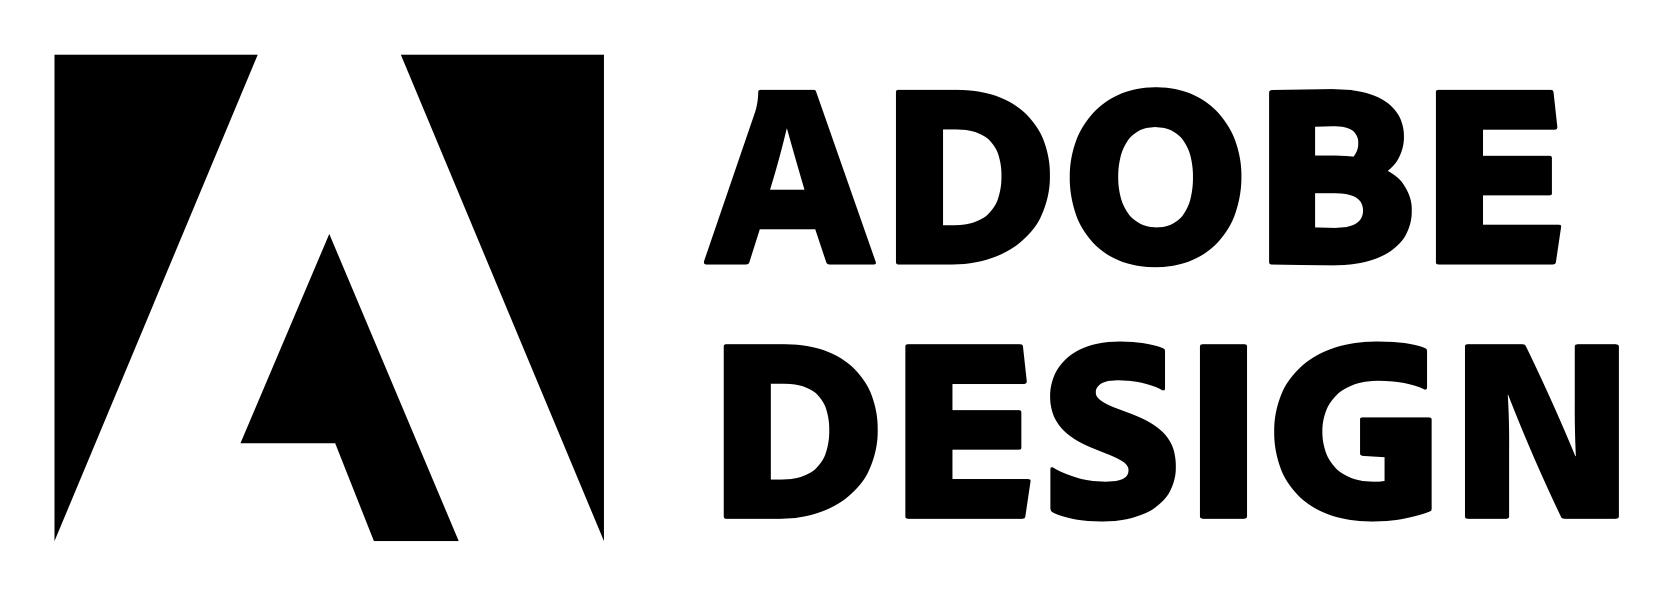 Adobe design logo